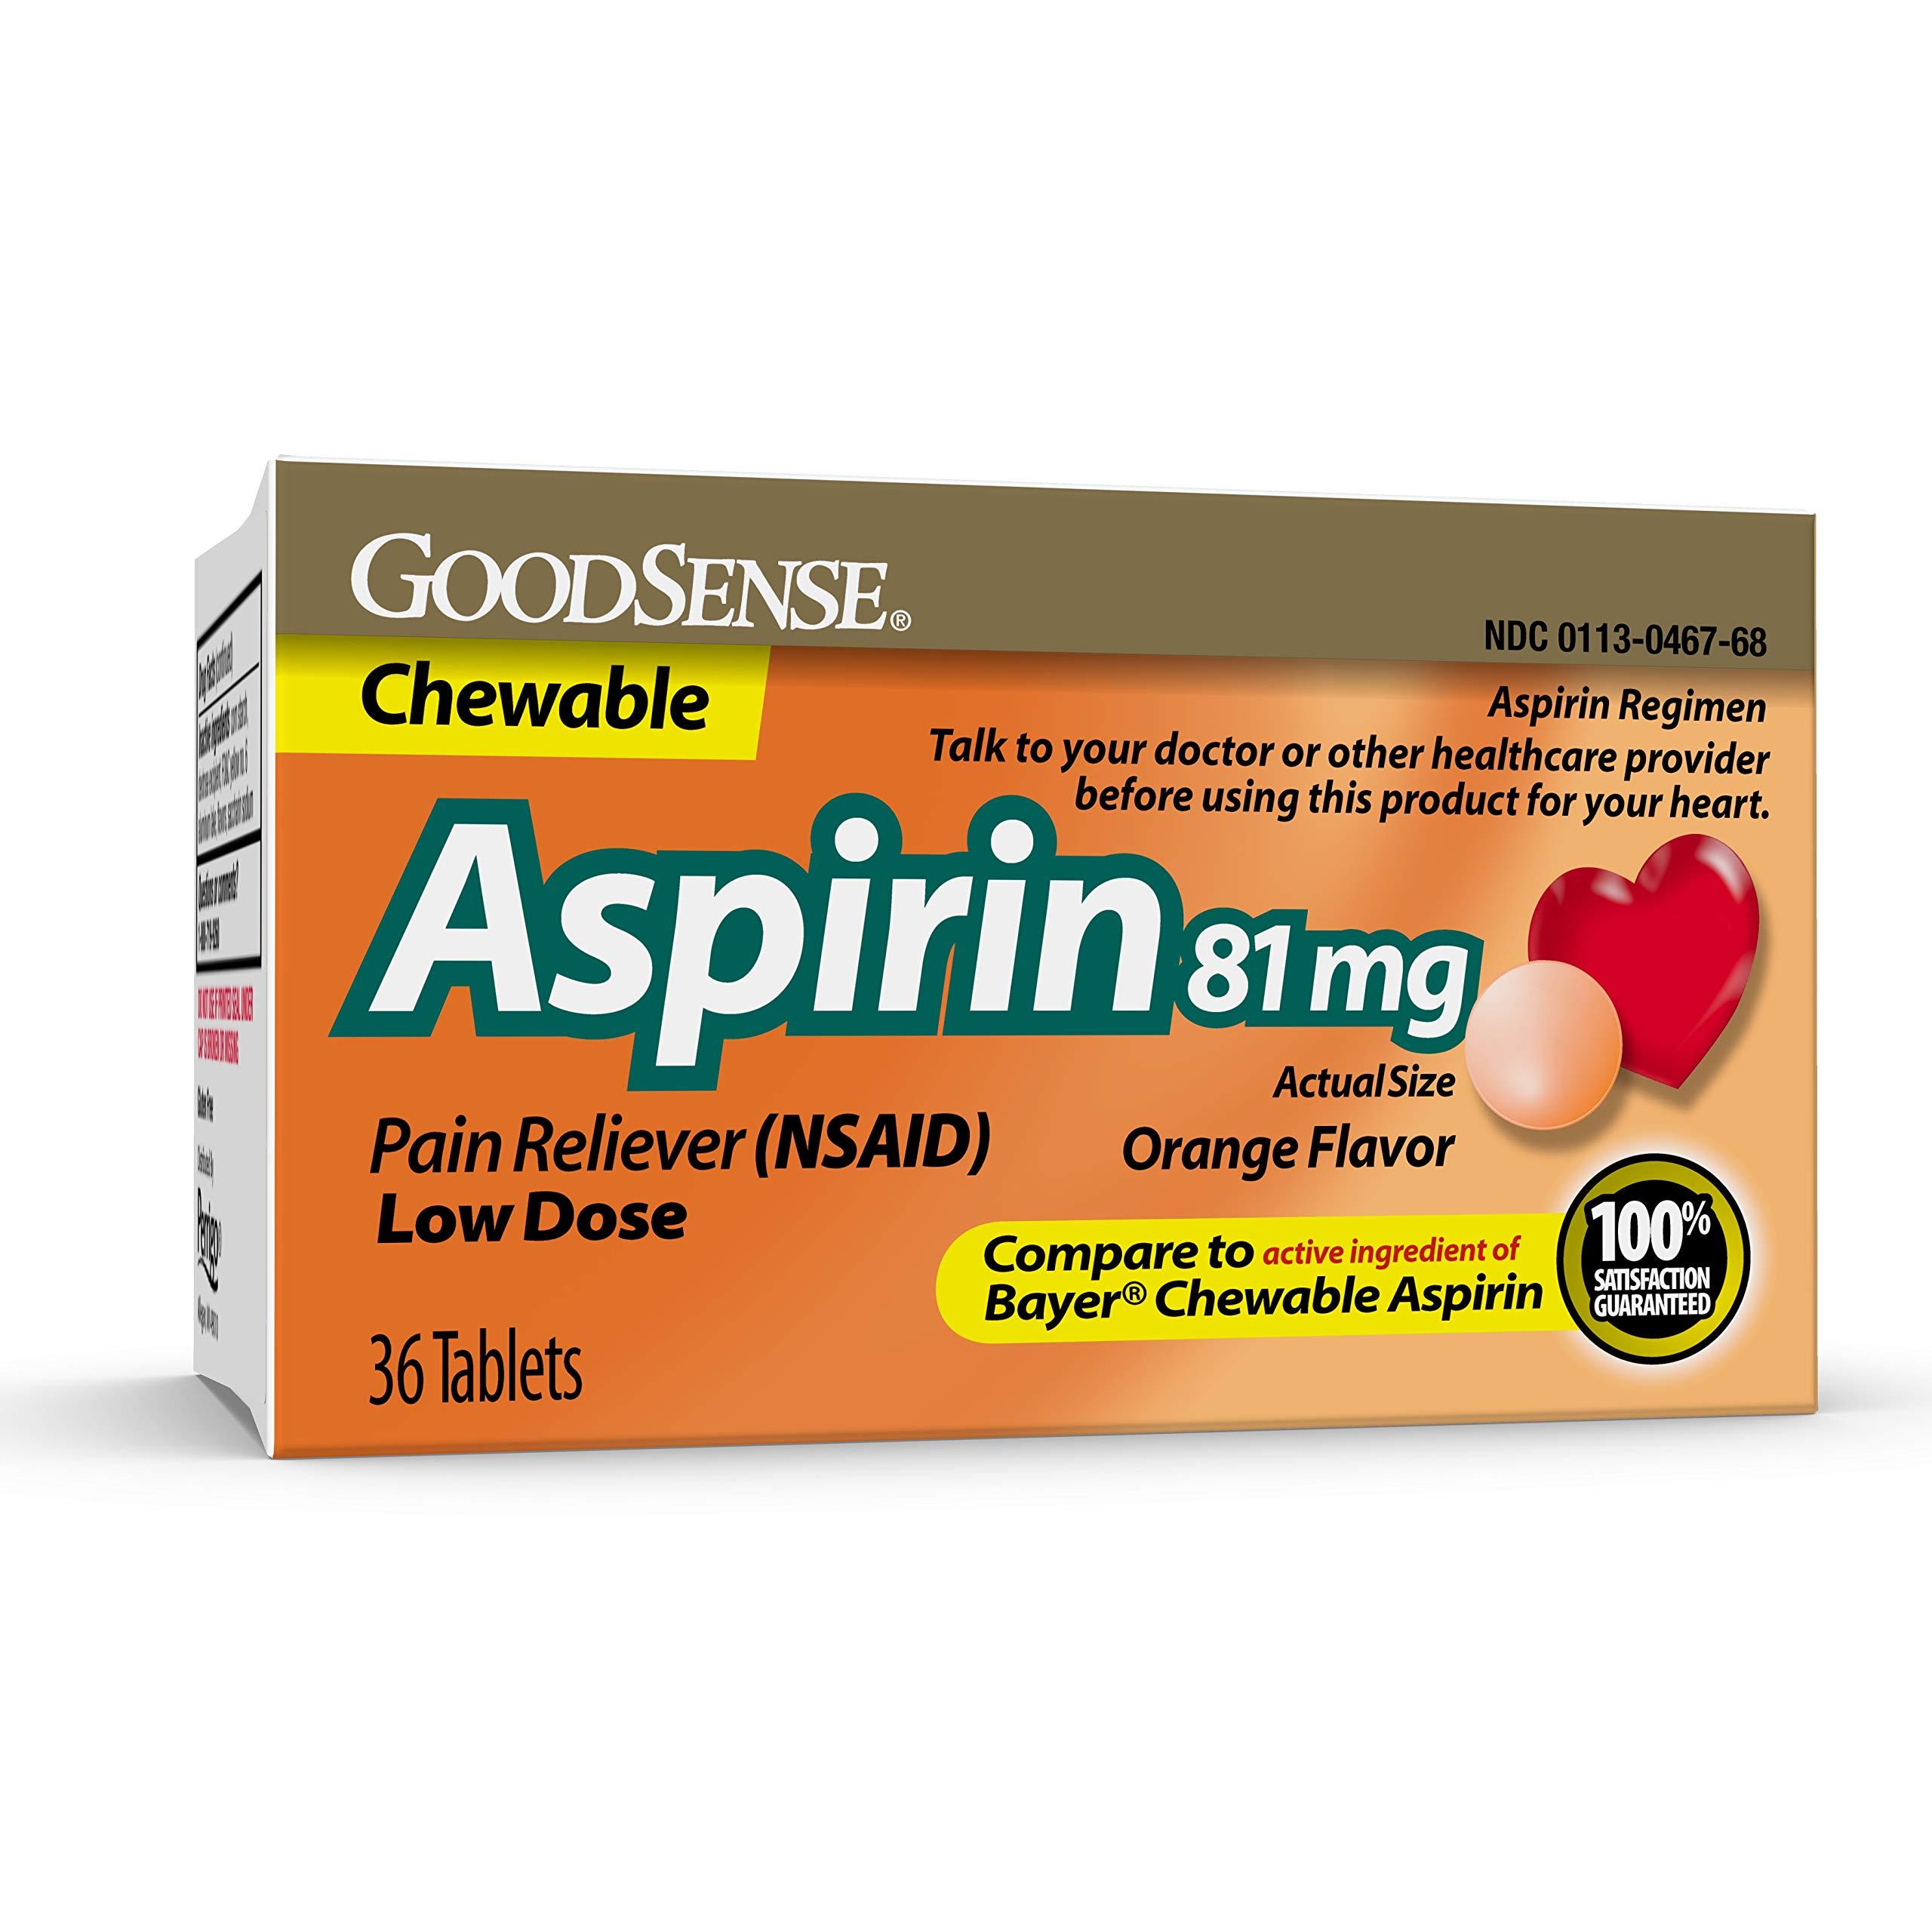 GoodSenseAspirin 81 mgPain Reliever (NSAID) Chewable Tablets, Low Dose Aspirin, Orange Flavor